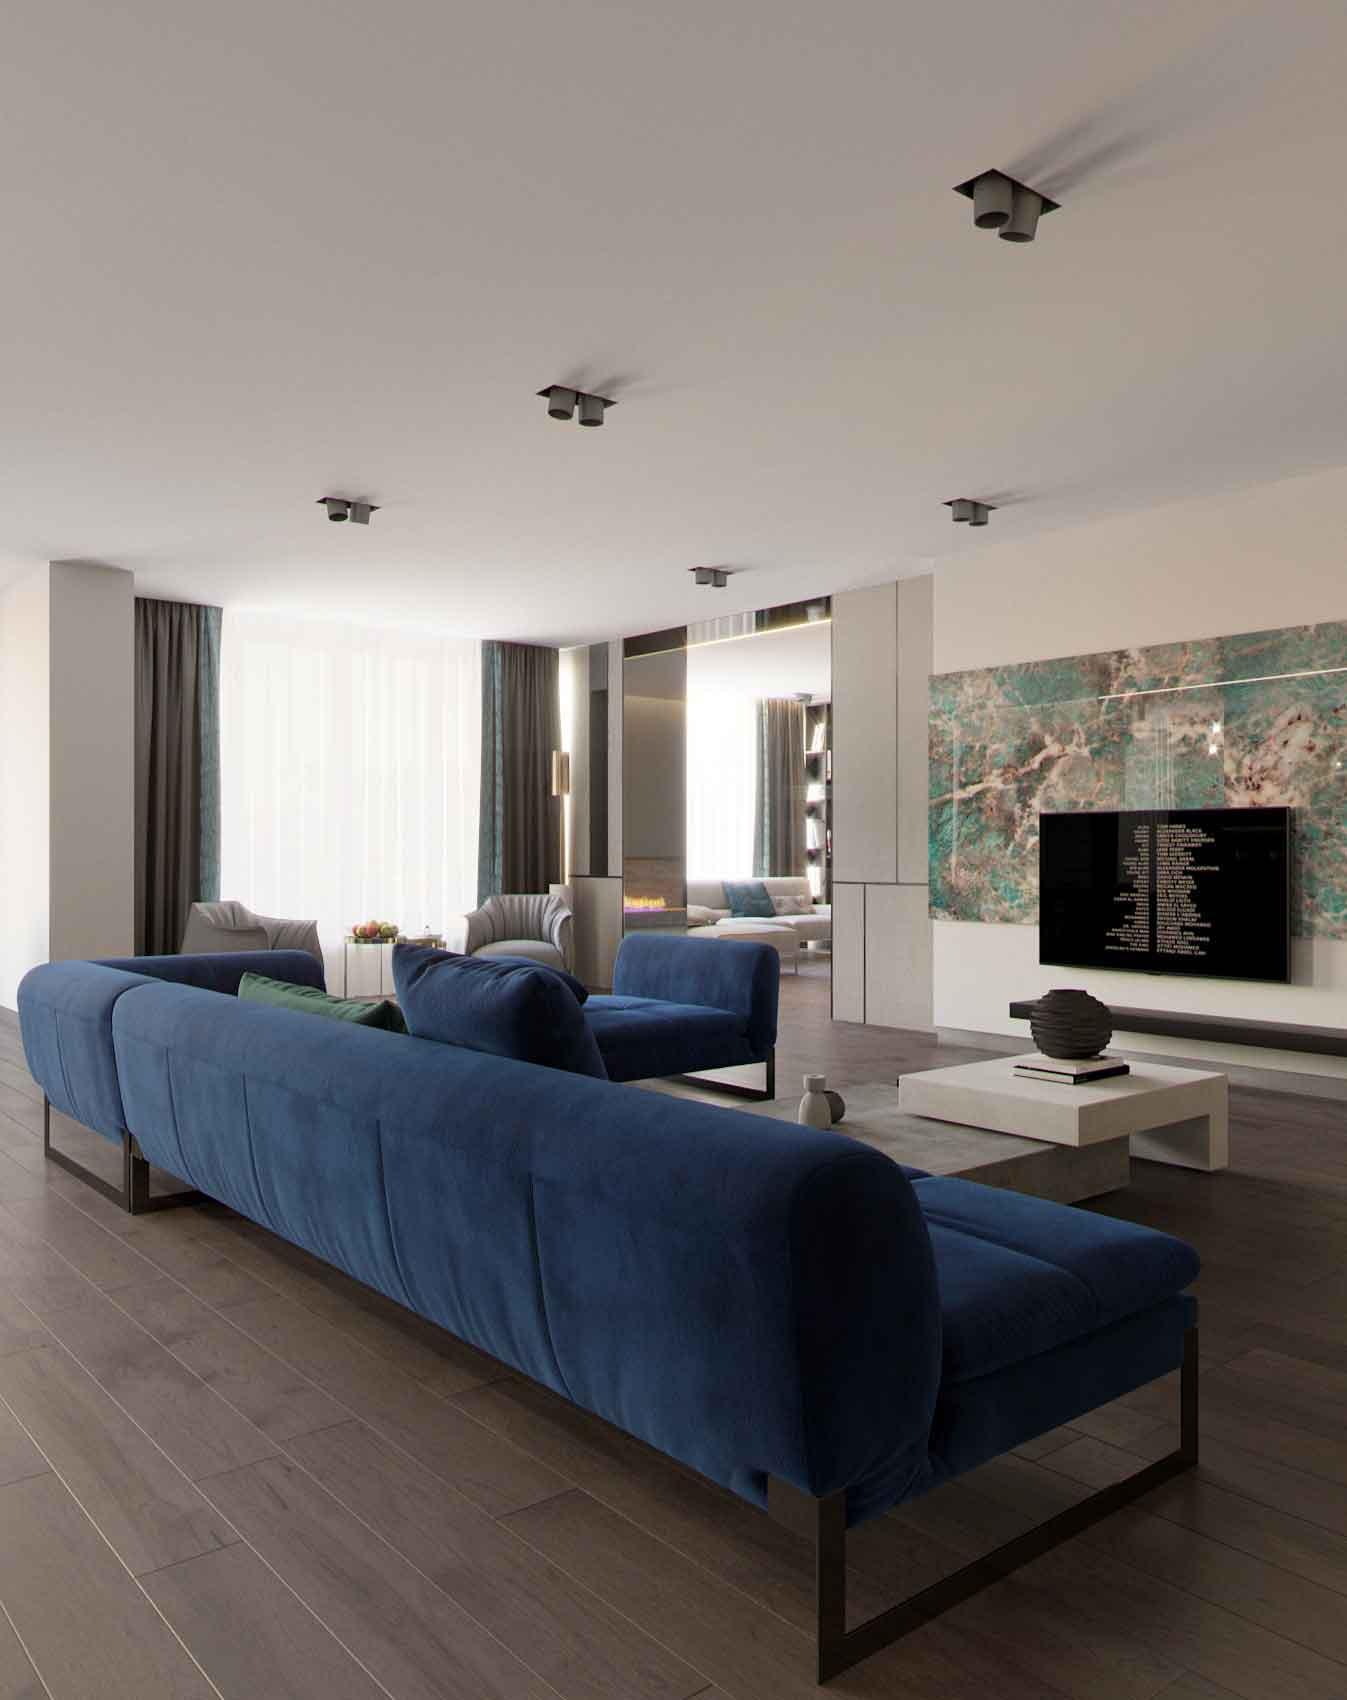 Апартаменты. Дизайн интерьера. Современный интерьер